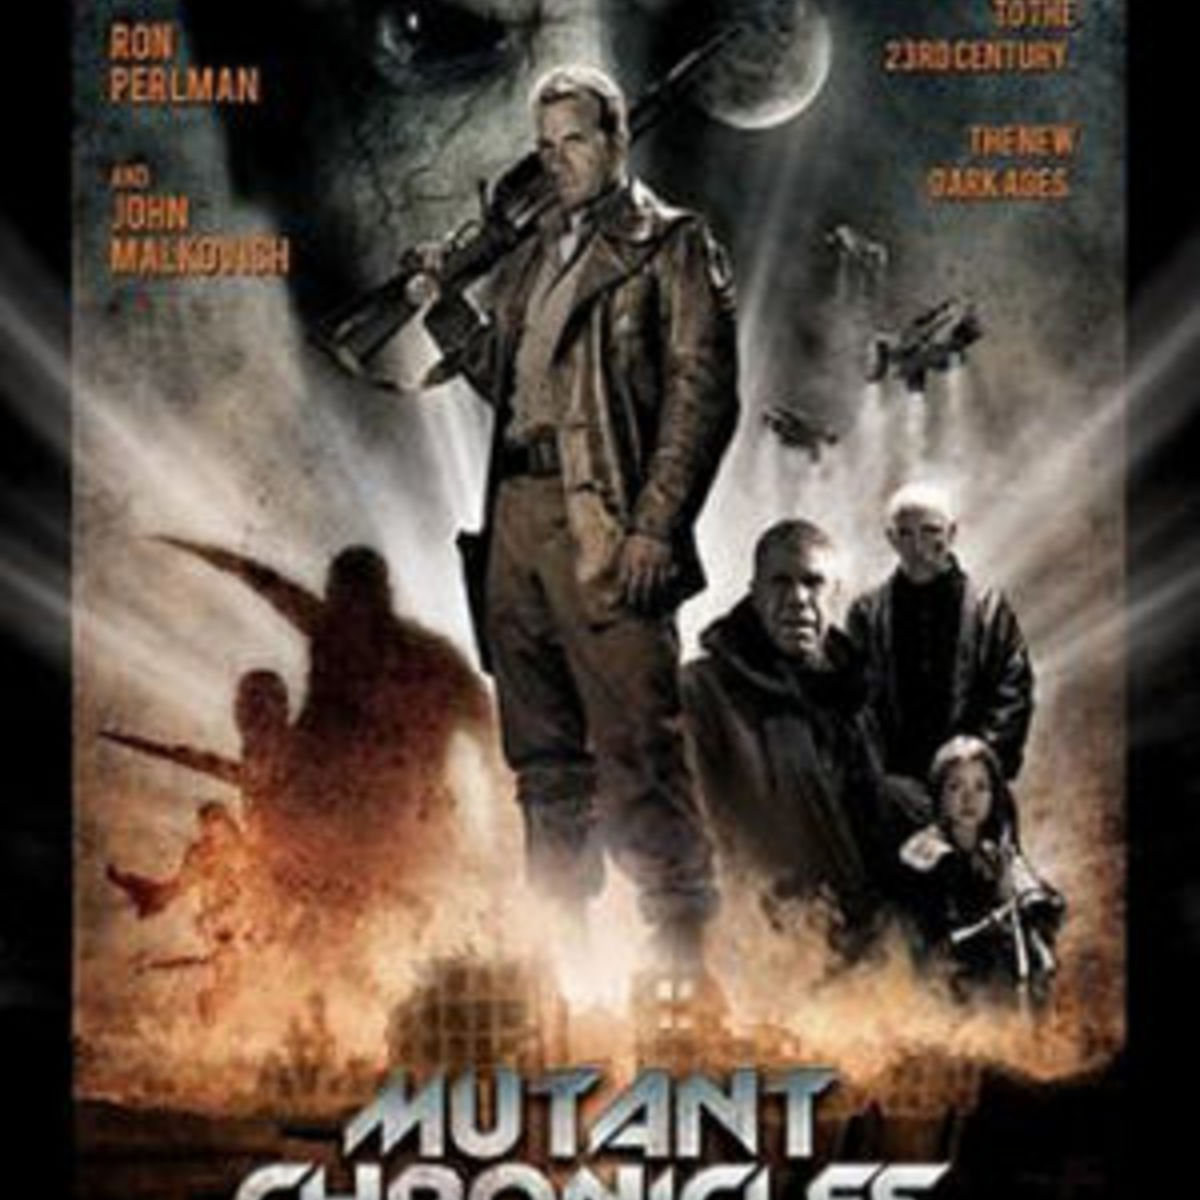 MutantChronicles_poster_1.jpg